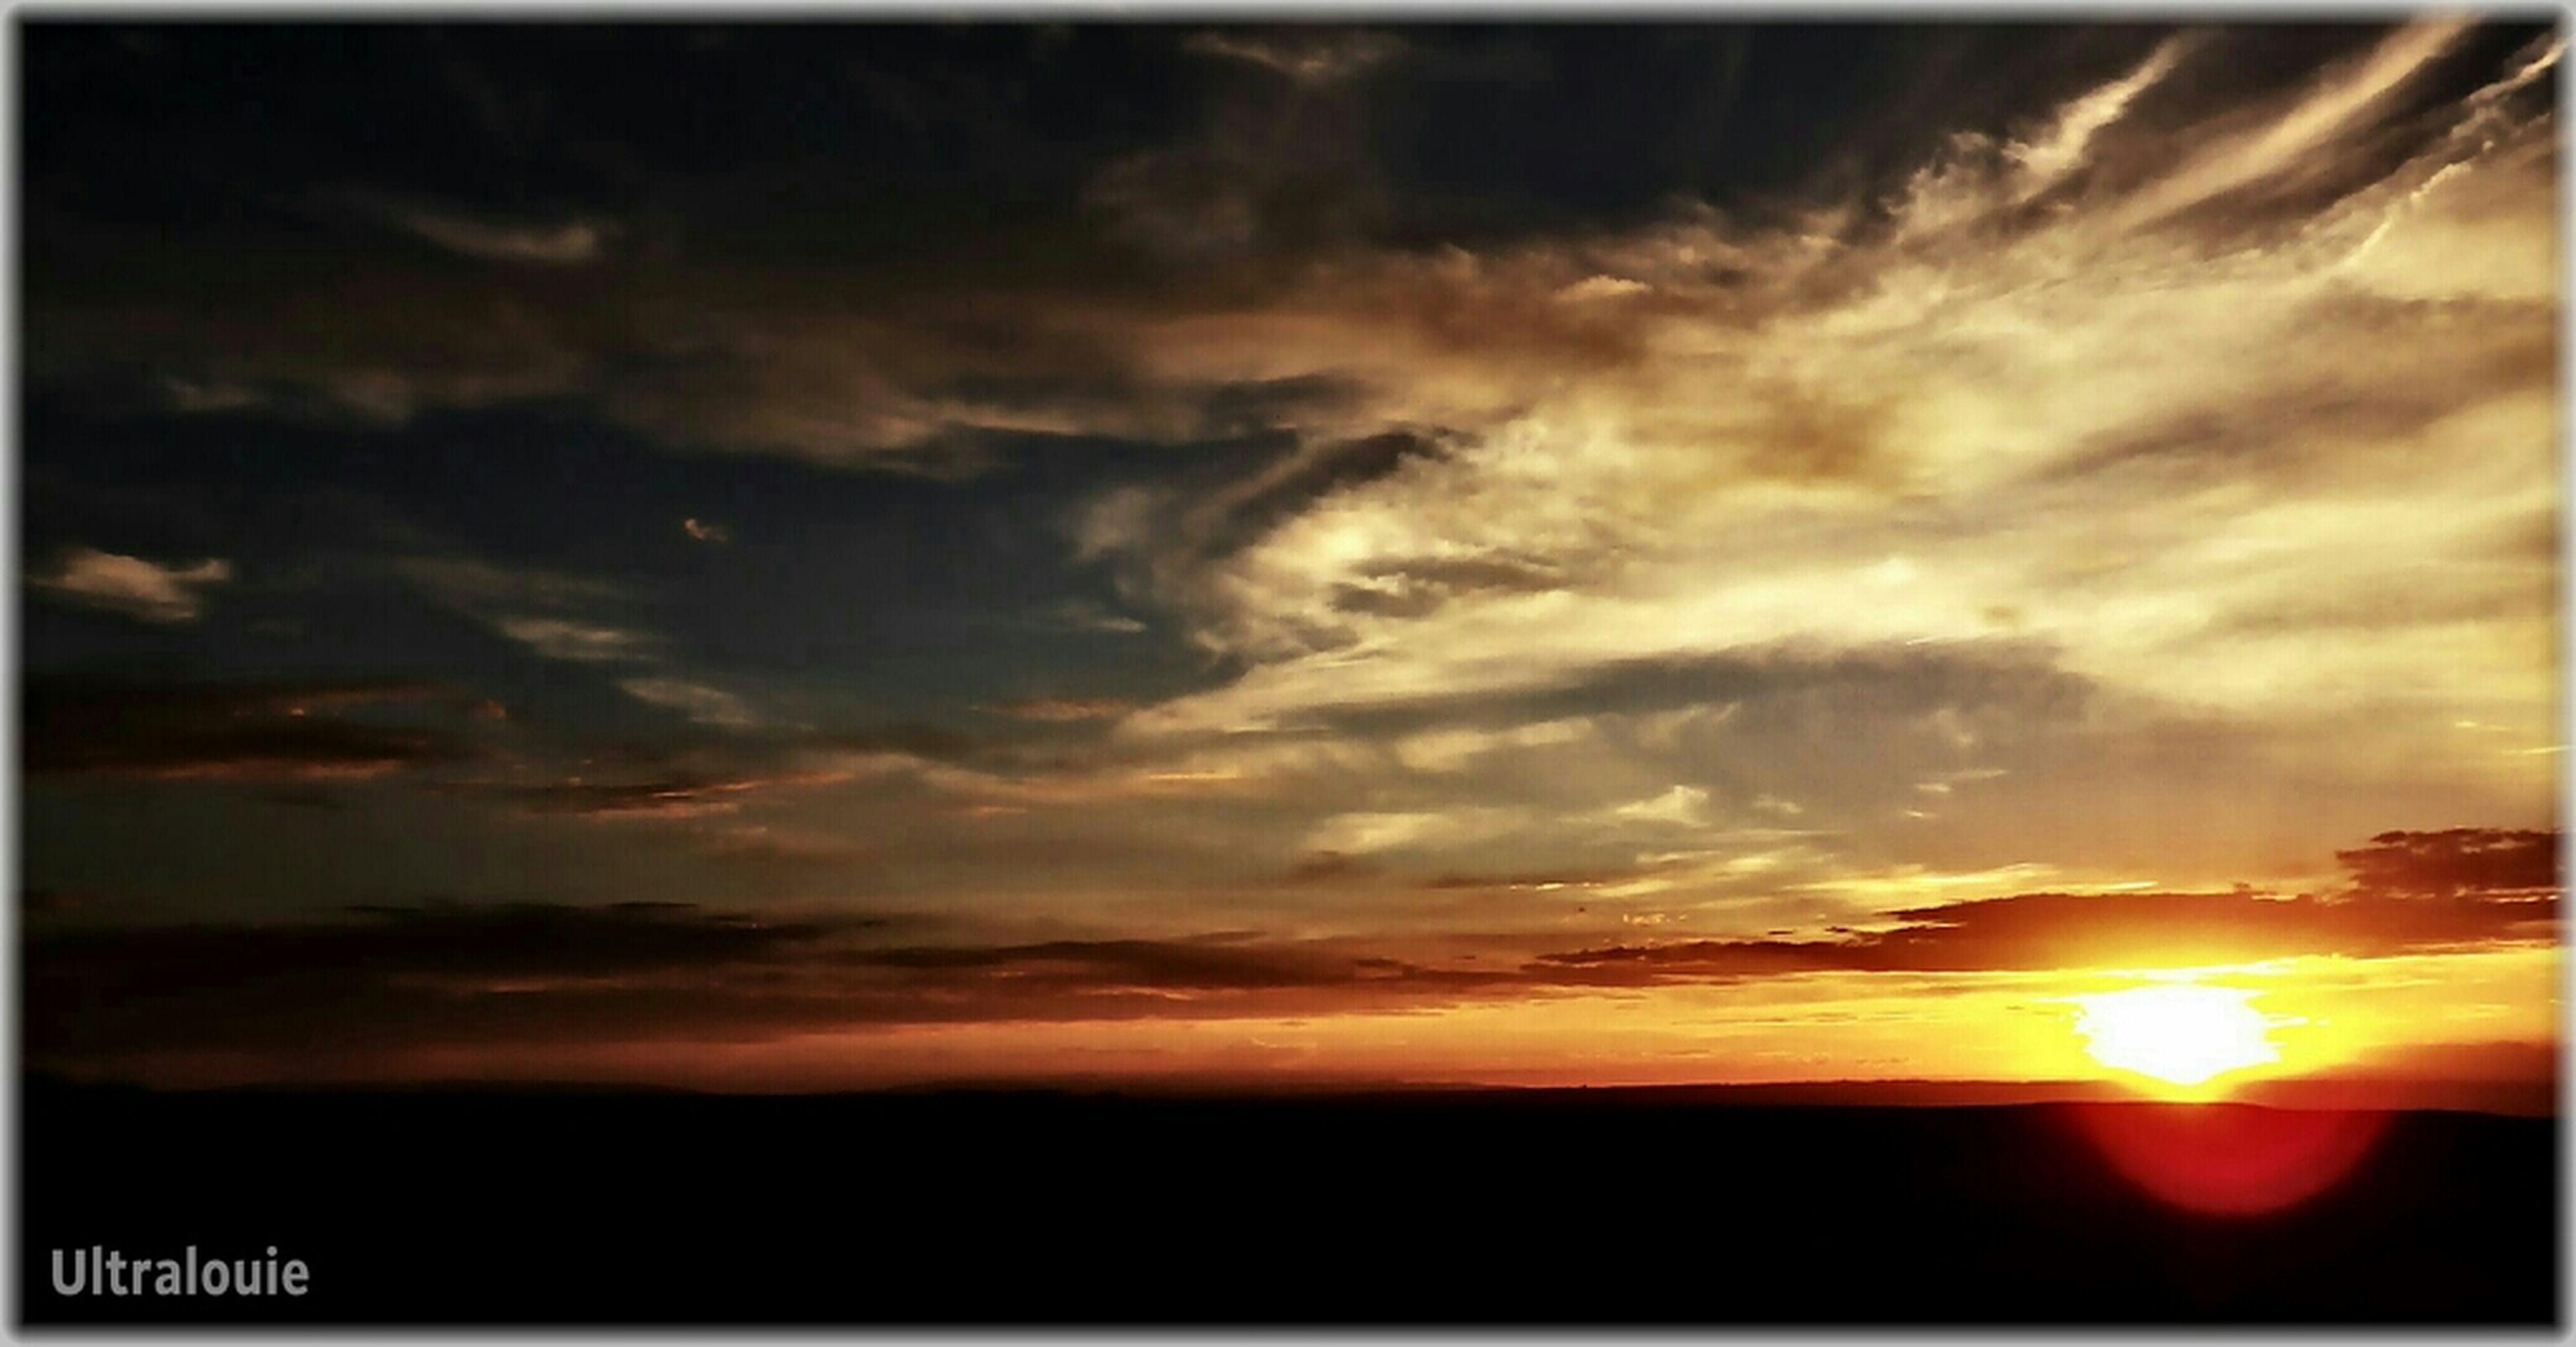 sunset, transfer print, sky, scenics, silhouette, beauty in nature, tranquil scene, sun, tranquility, orange color, cloud - sky, auto post production filter, nature, idyllic, dramatic sky, cloud, sunlight, landscape, moody sky, cloudy